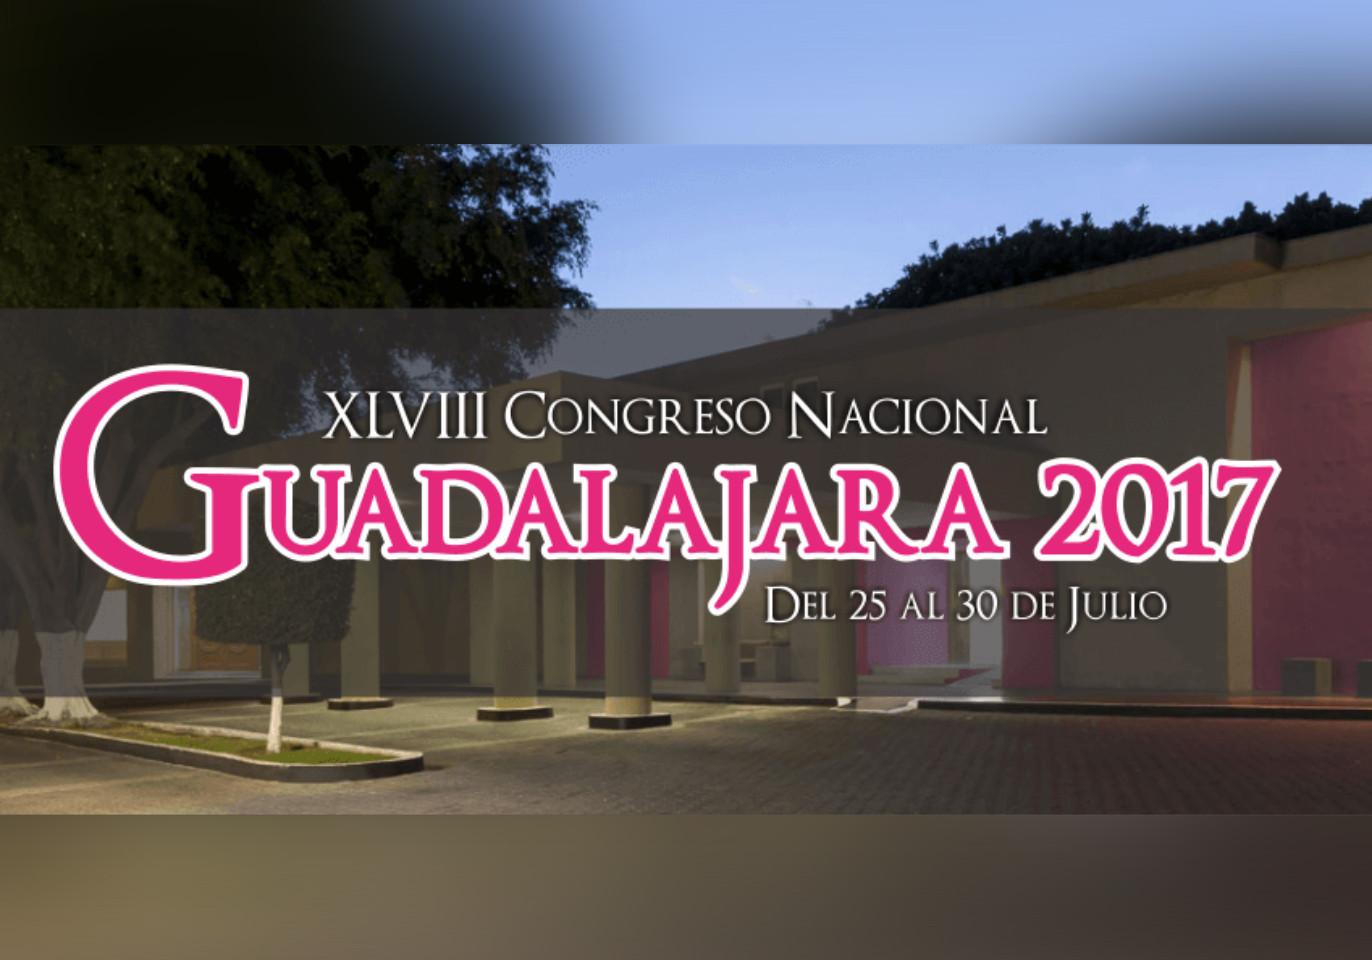 Convocatoria XLVIII Congreso Nacional Guadalajara 2017.